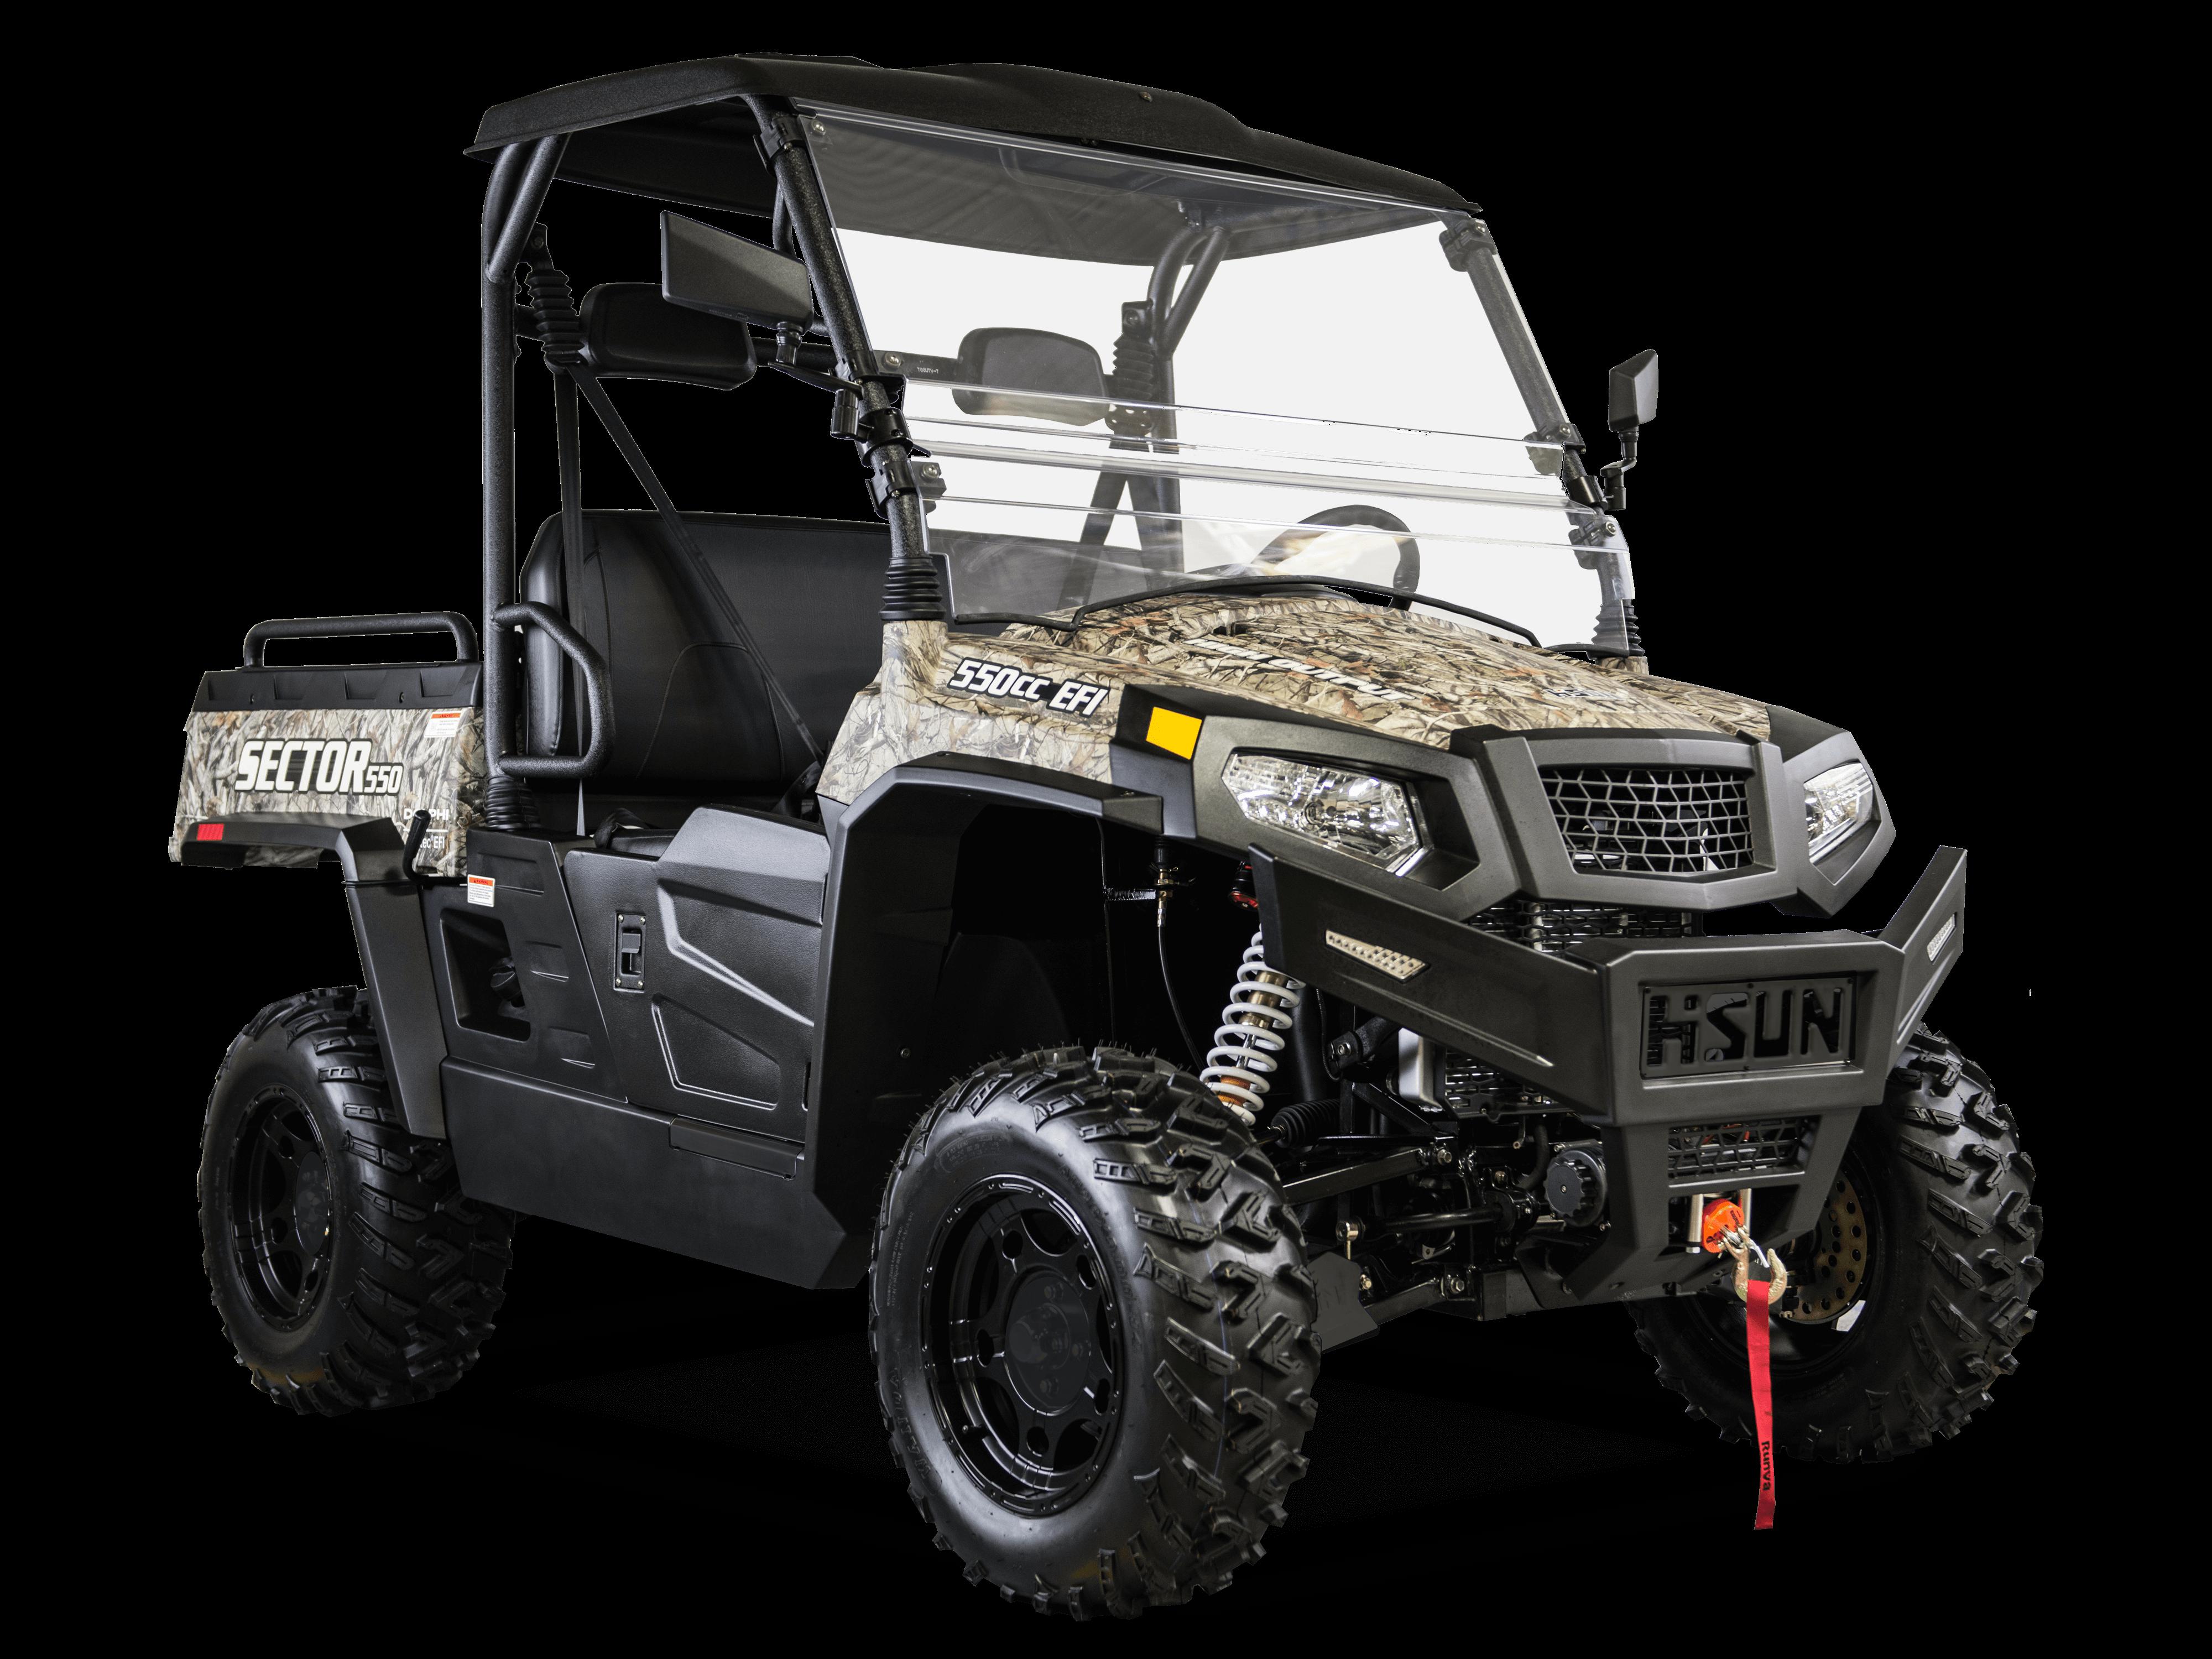 Hisun Motors | Sector | SECTOR 550